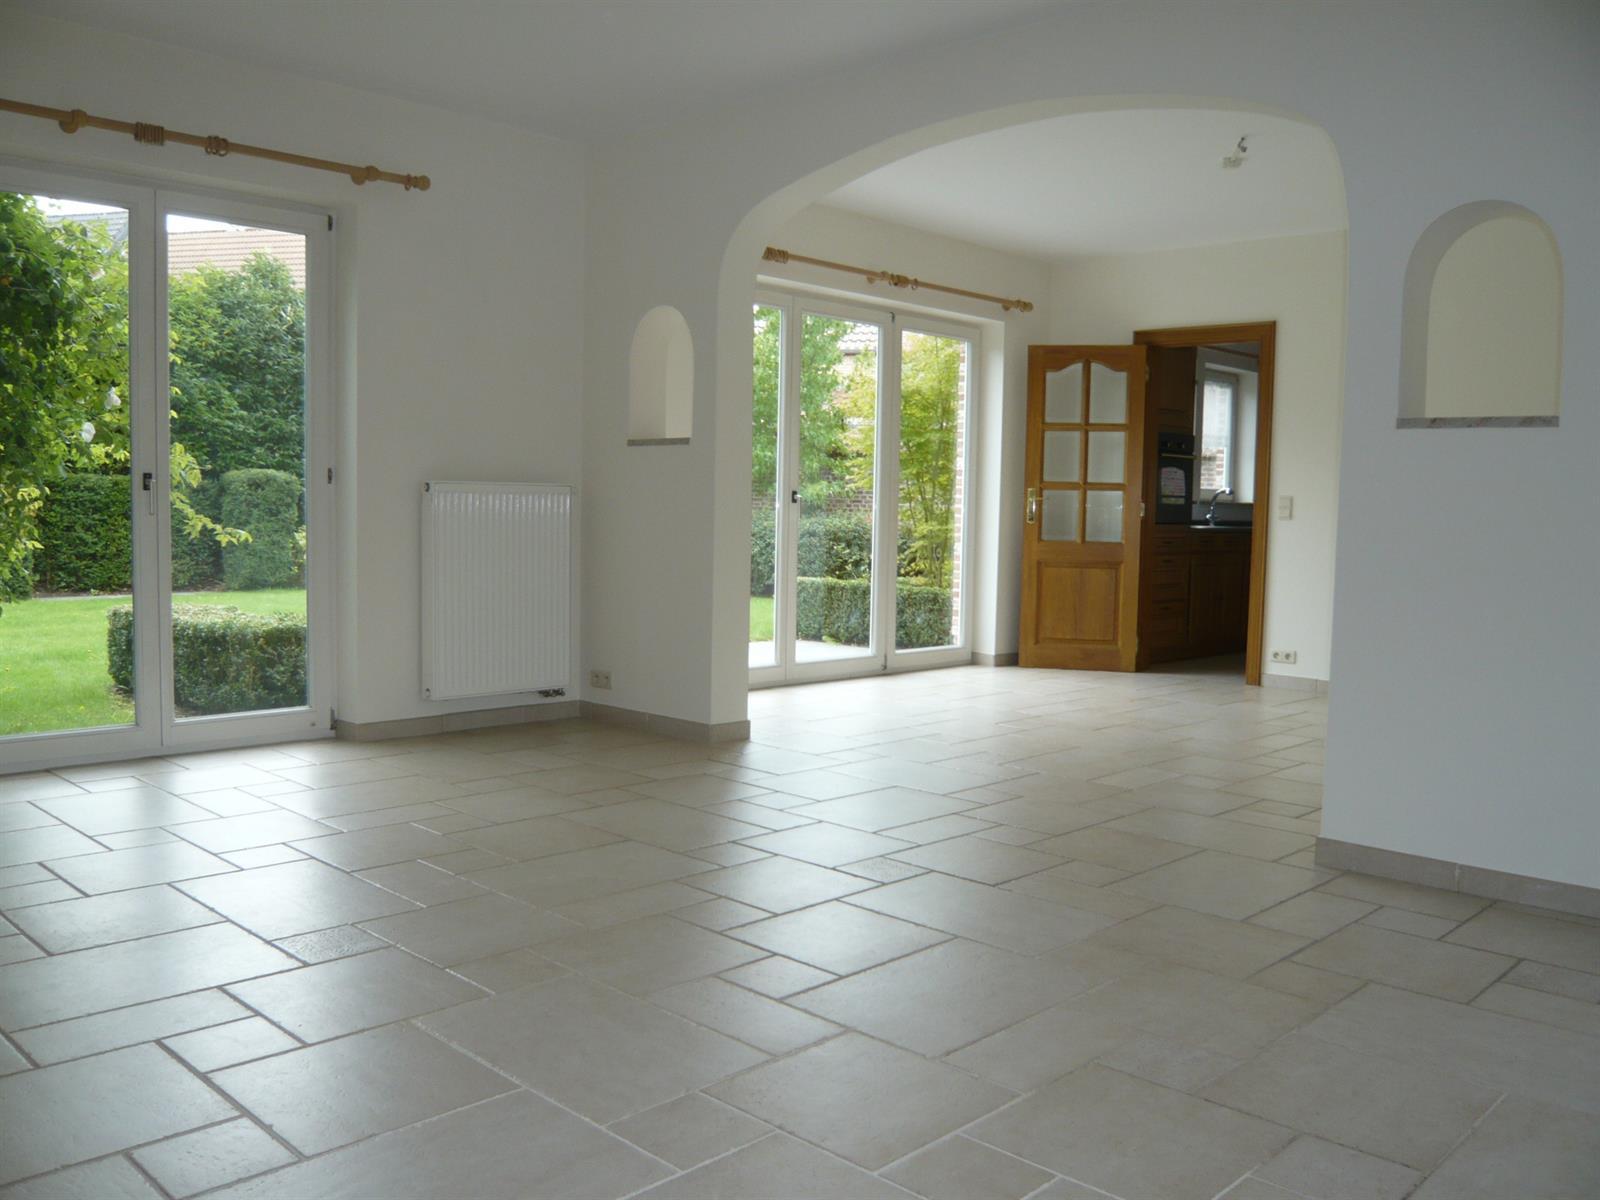 Villa - Braine-l'Alleud - #3981723-25